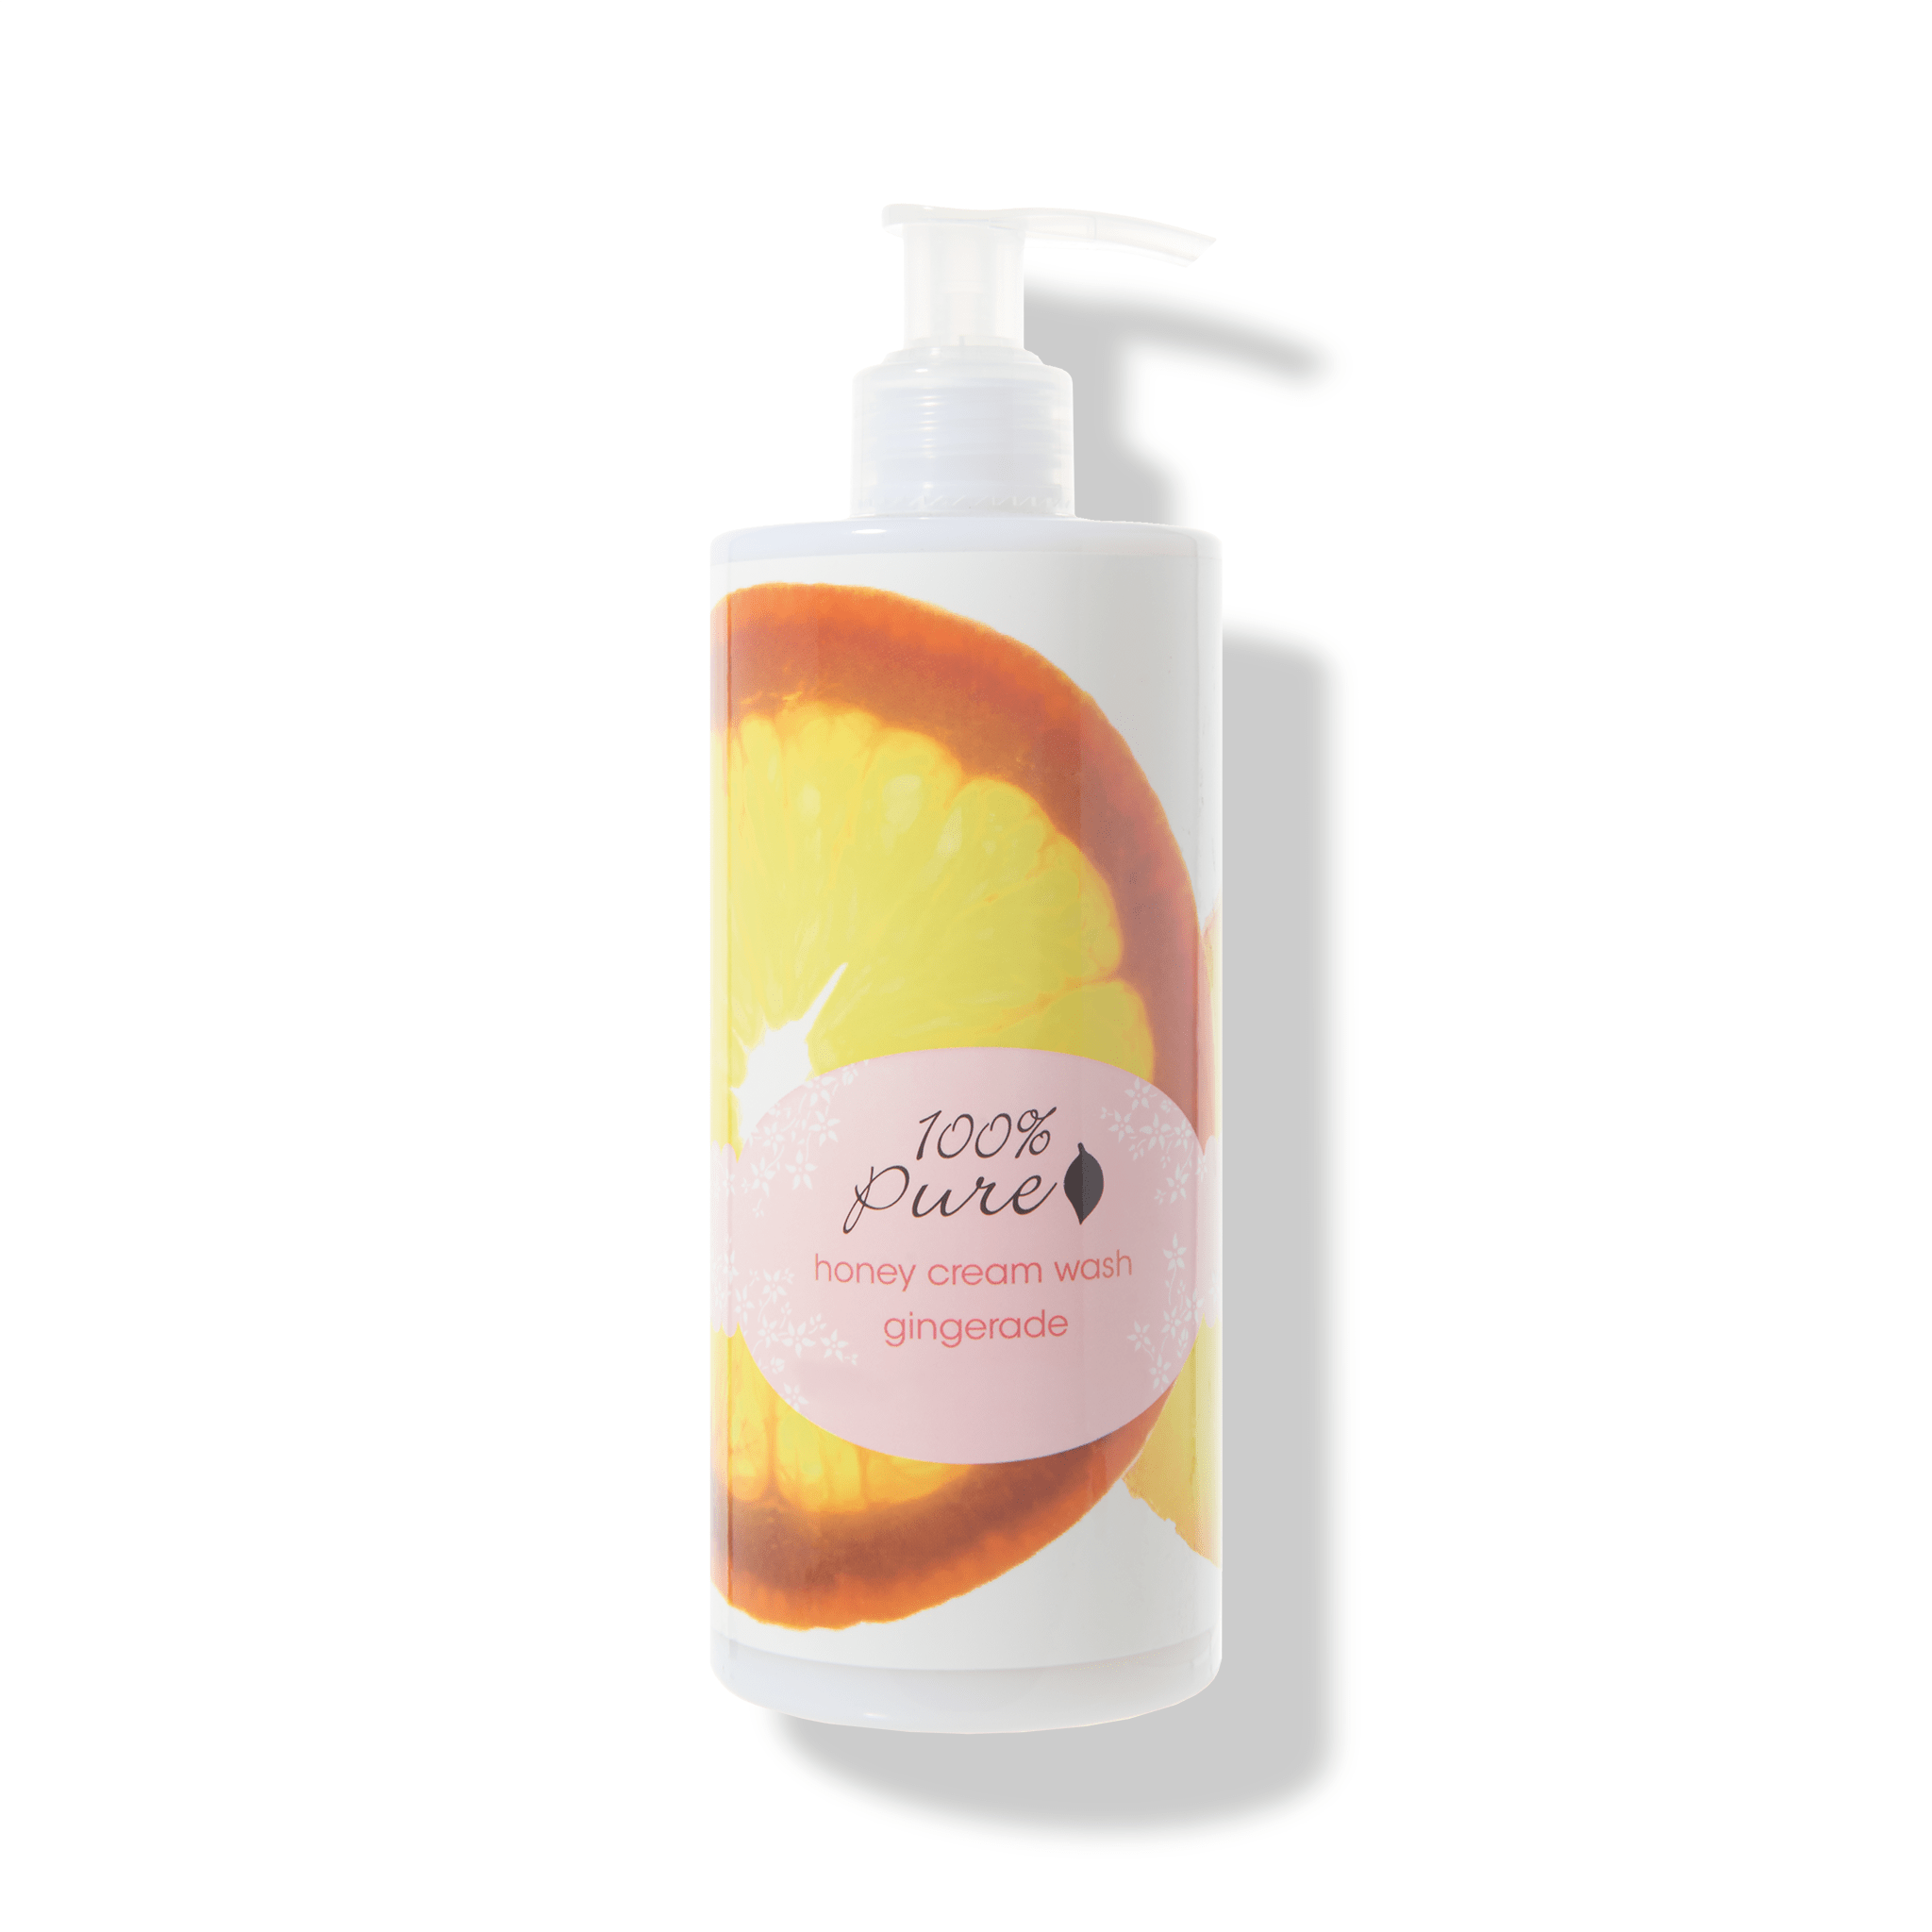 Product Grid - Honey Cream Wash Gingerade